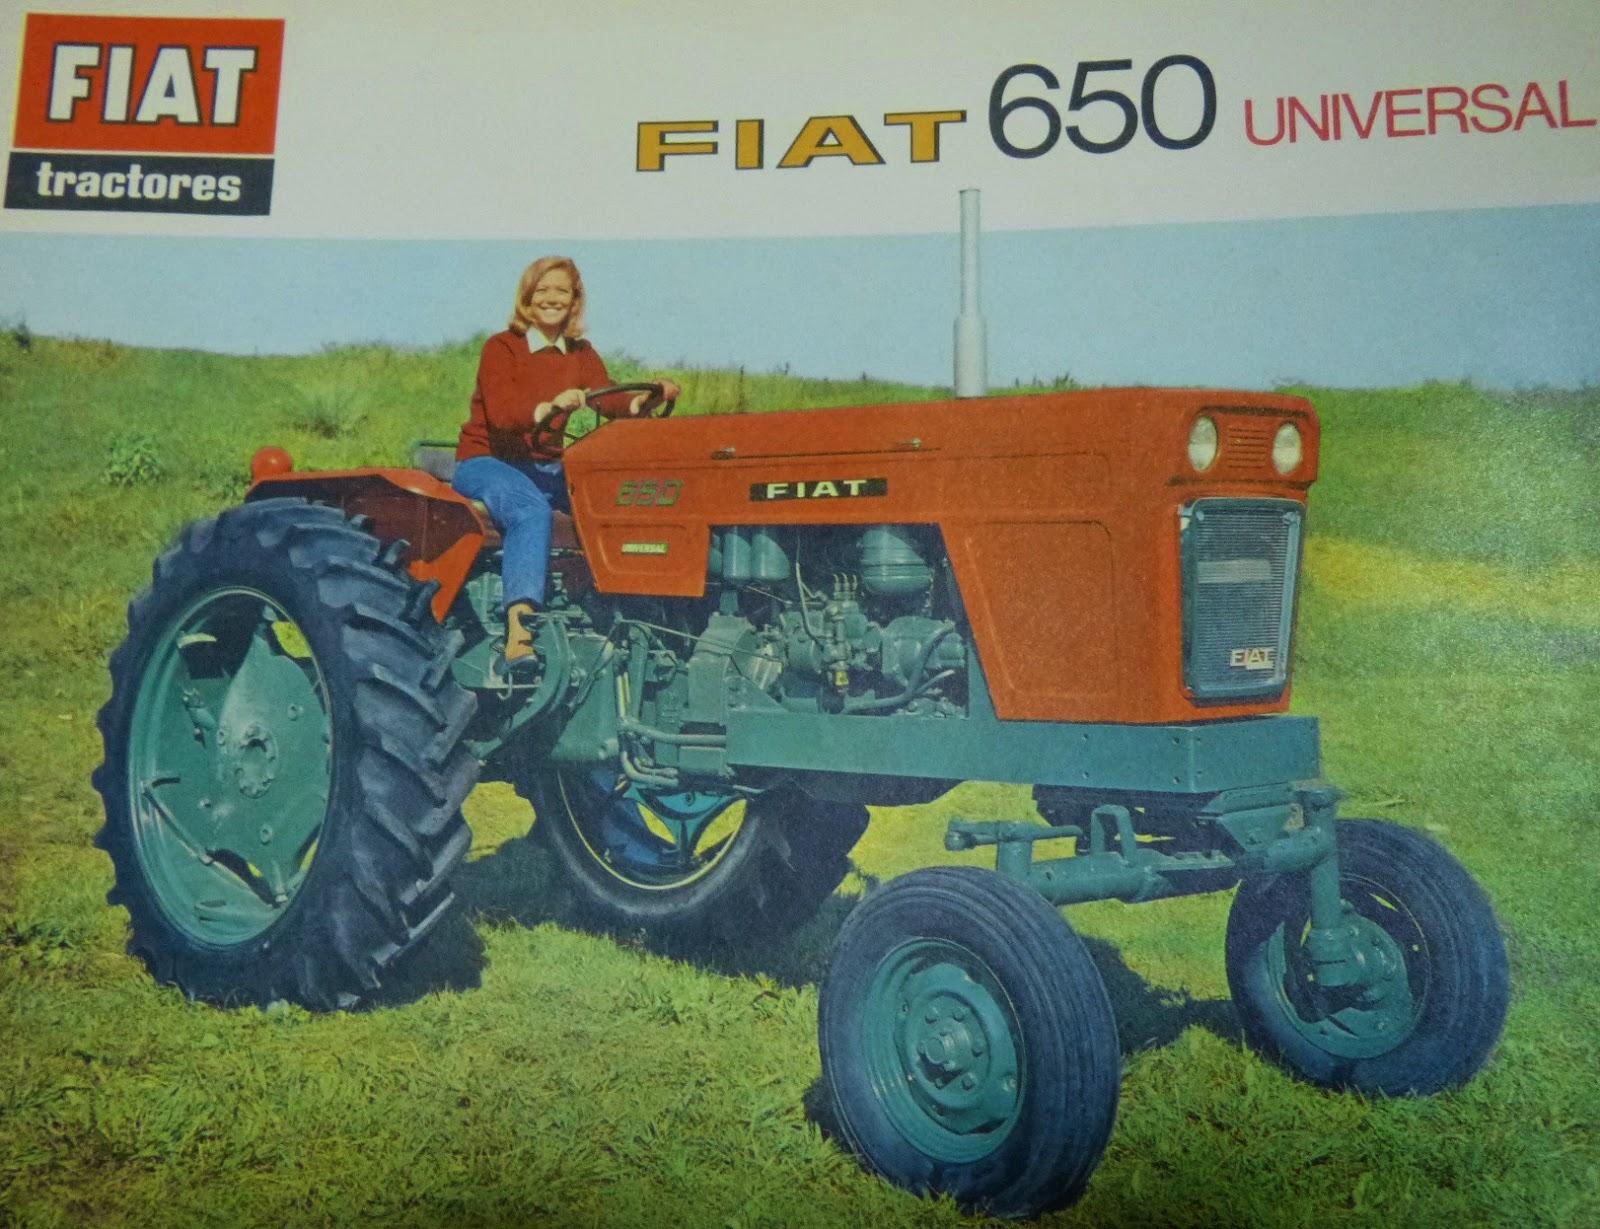 pesados argentinos fiat 650 universal standard rh pesadosargentinos blogspot com Fiat 100 Fiat Tractor Italy